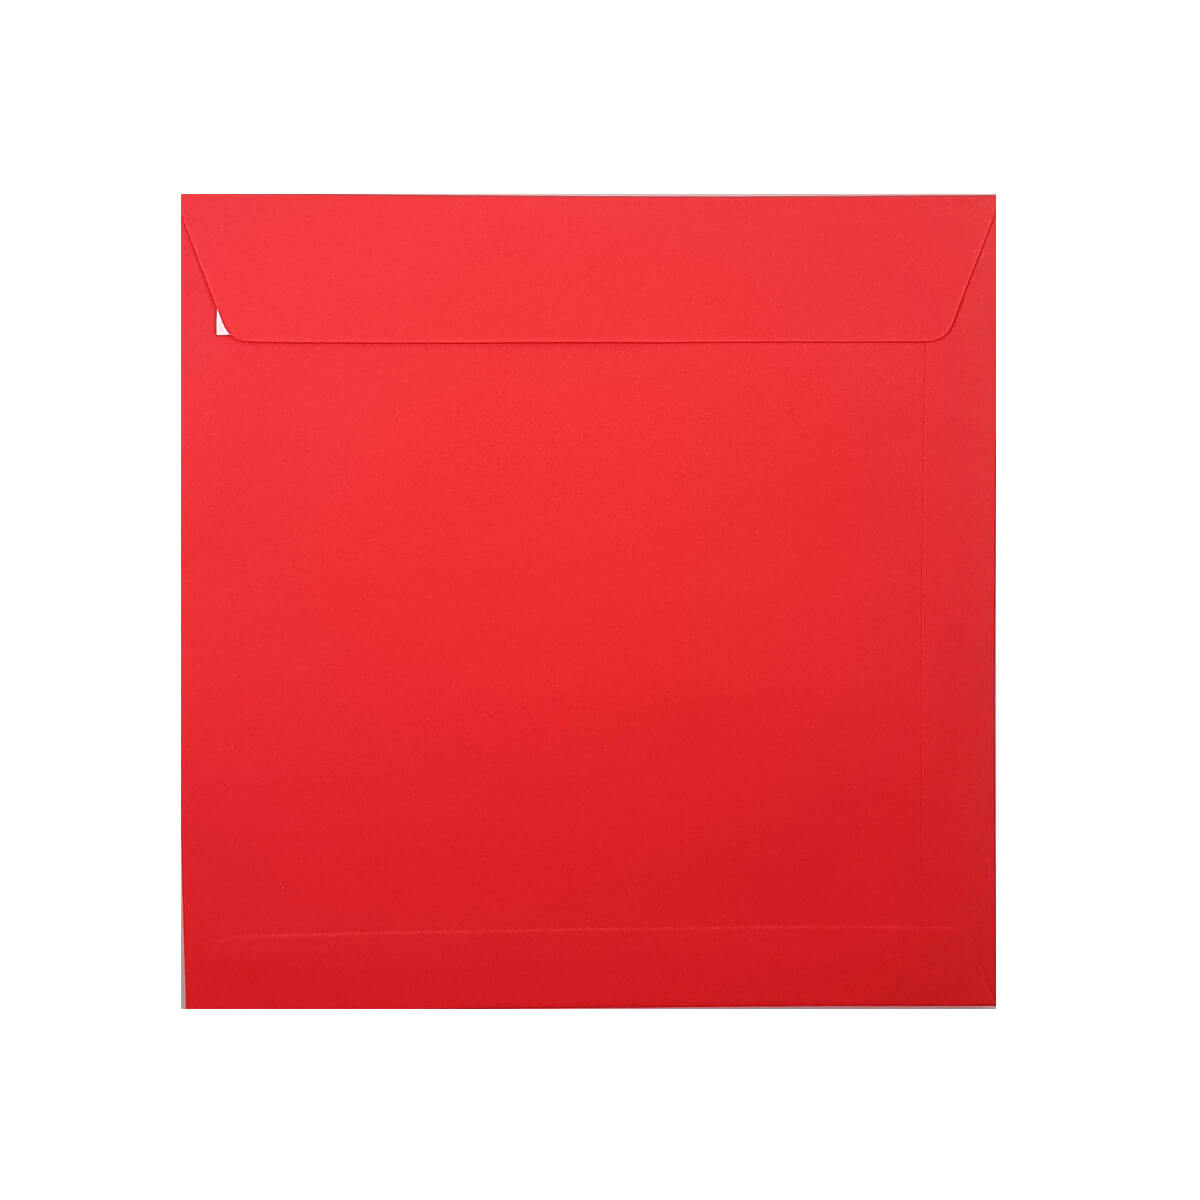 BRIGHT RED 220mm SQUARE PEEL & SEAL ENVELOPES